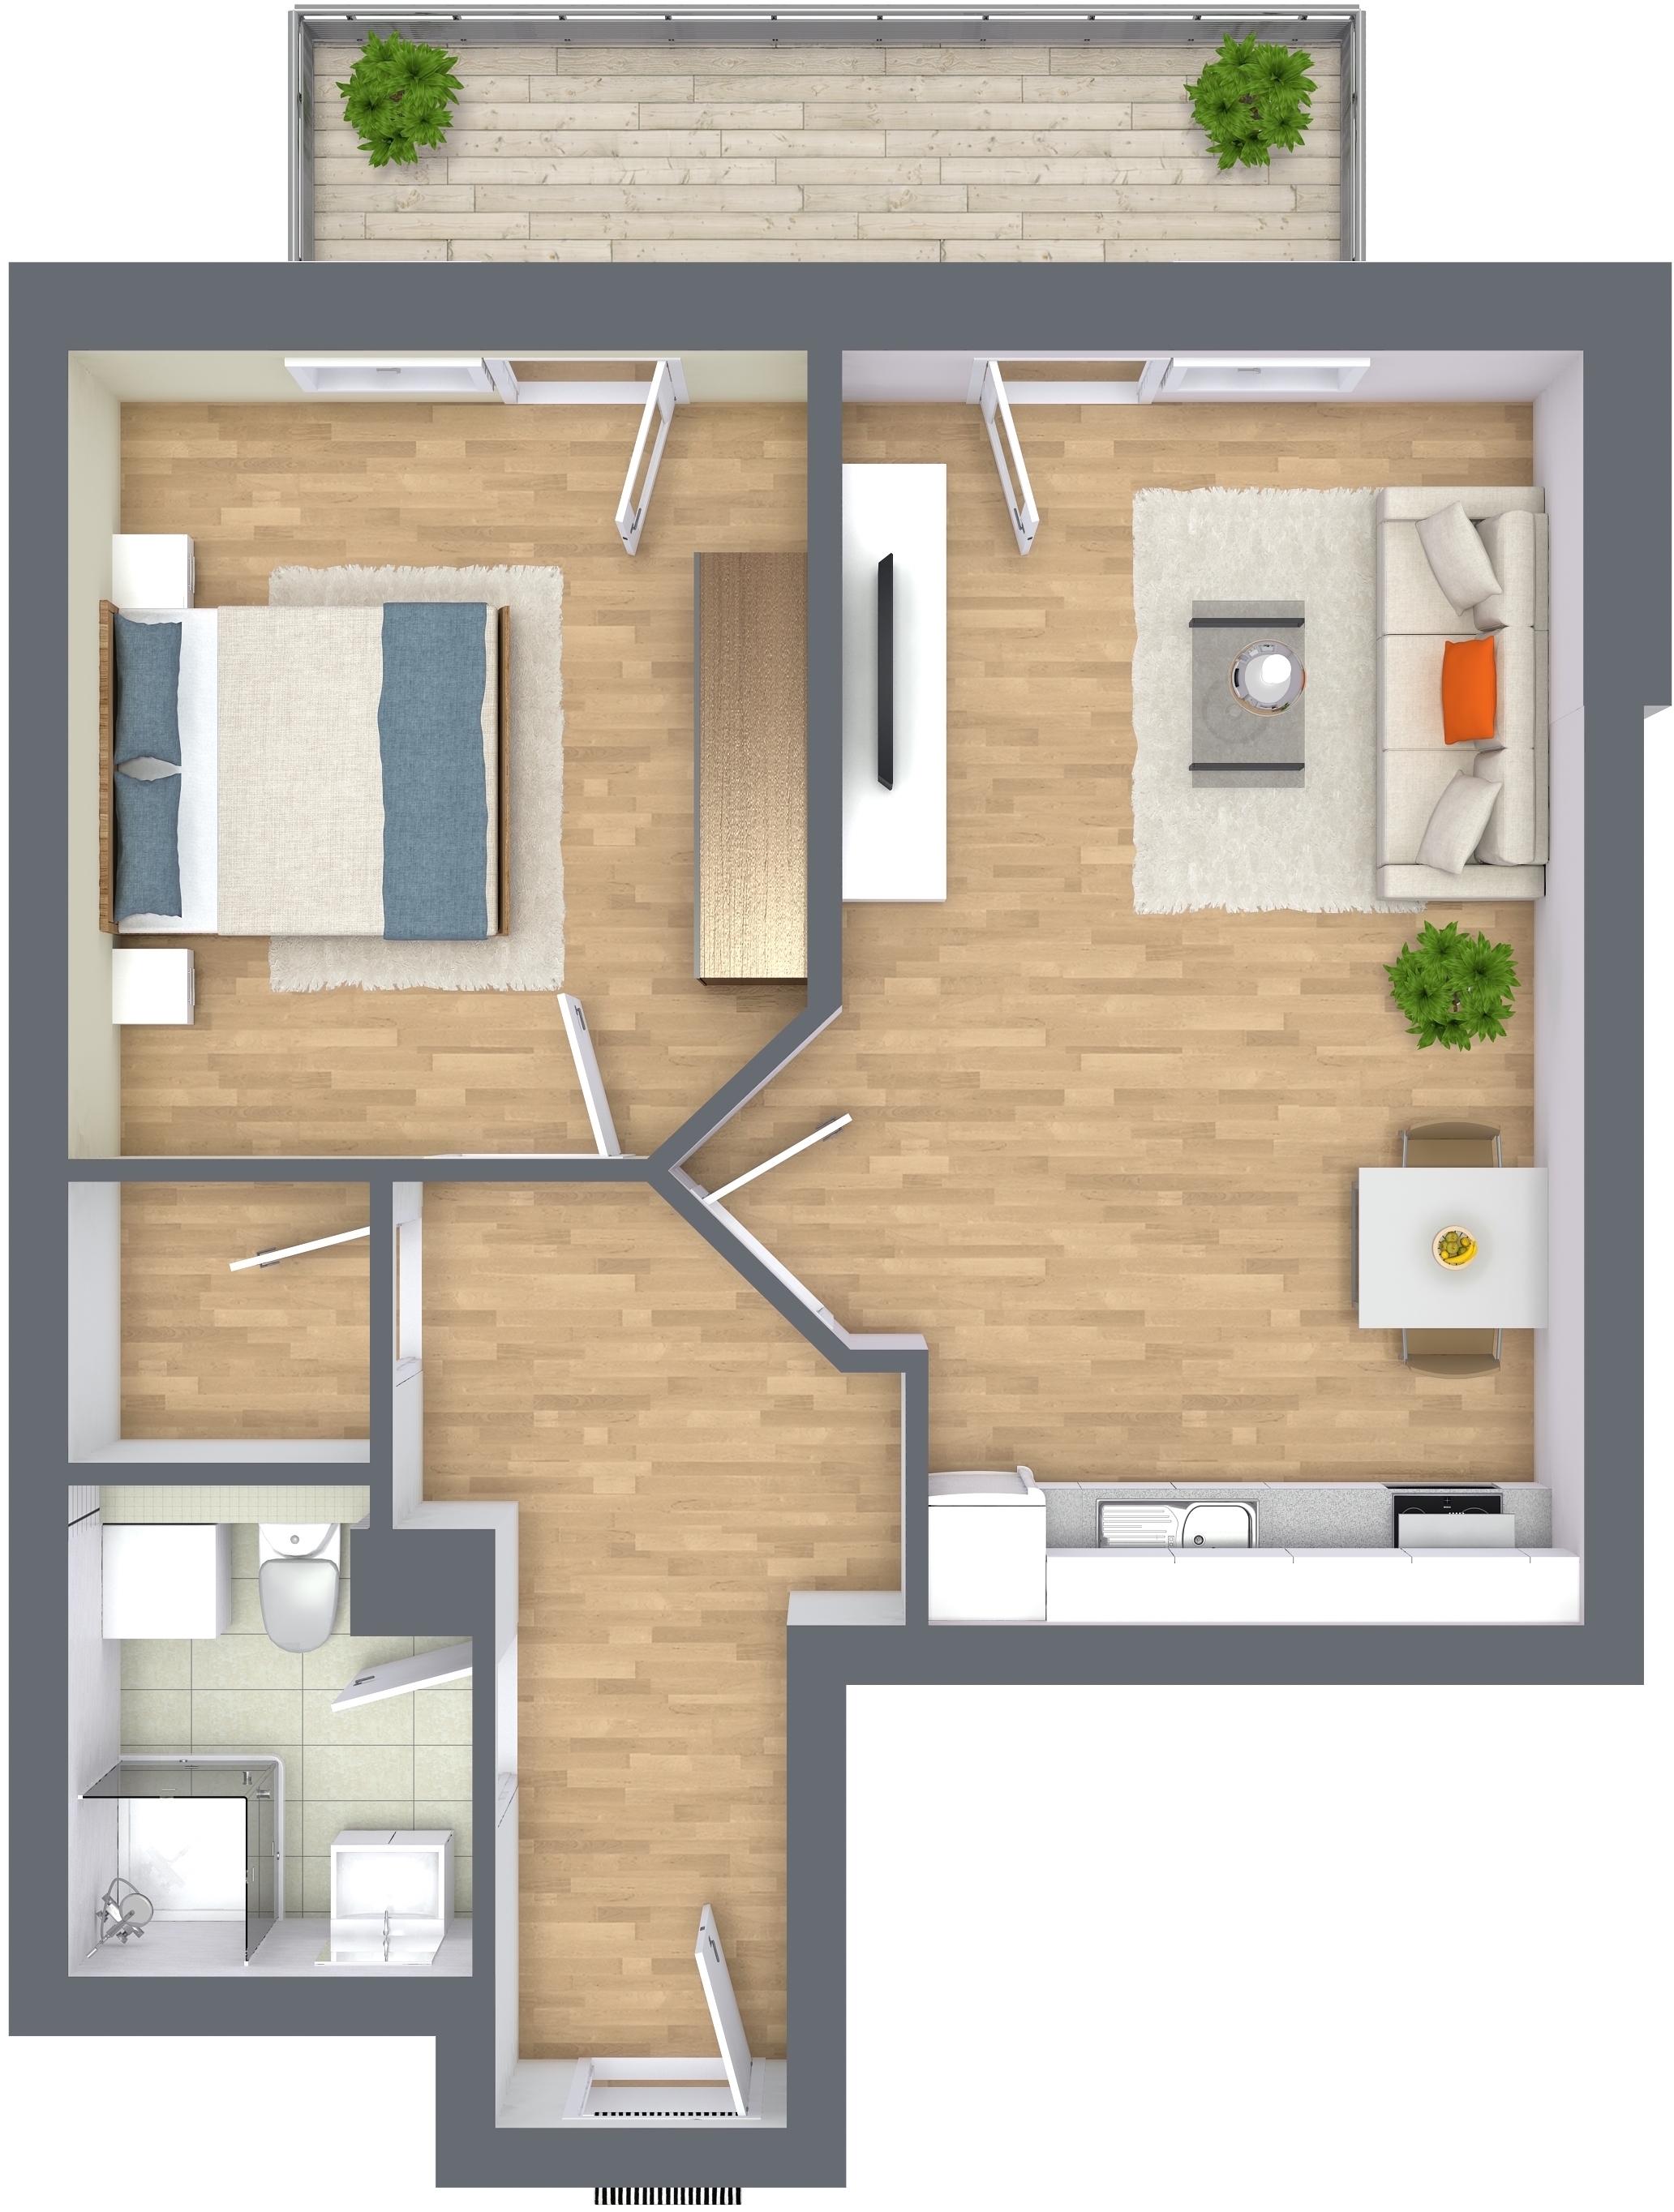 das raumwunder im obergeschoss d5 oliver klenz der immobilienprofi. Black Bedroom Furniture Sets. Home Design Ideas